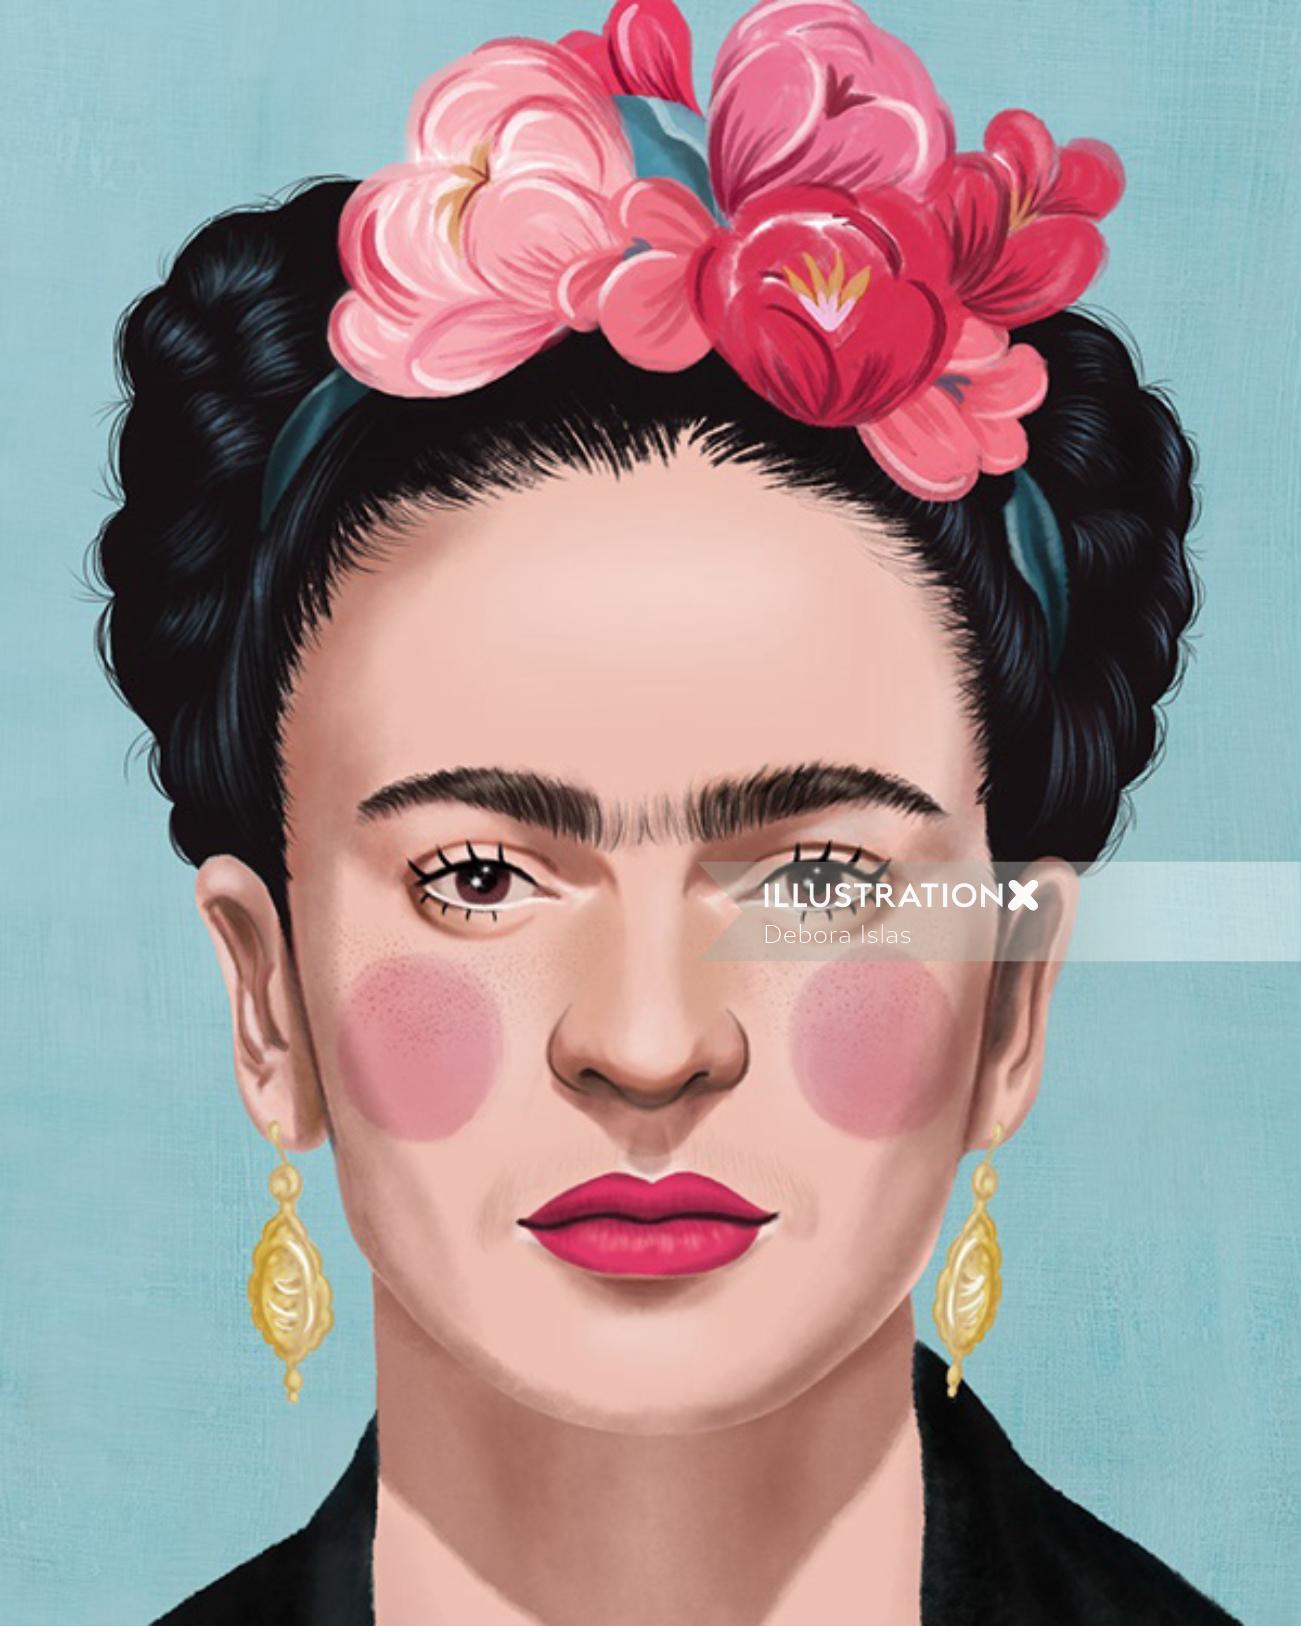 Frida Kahlo portrait illustration